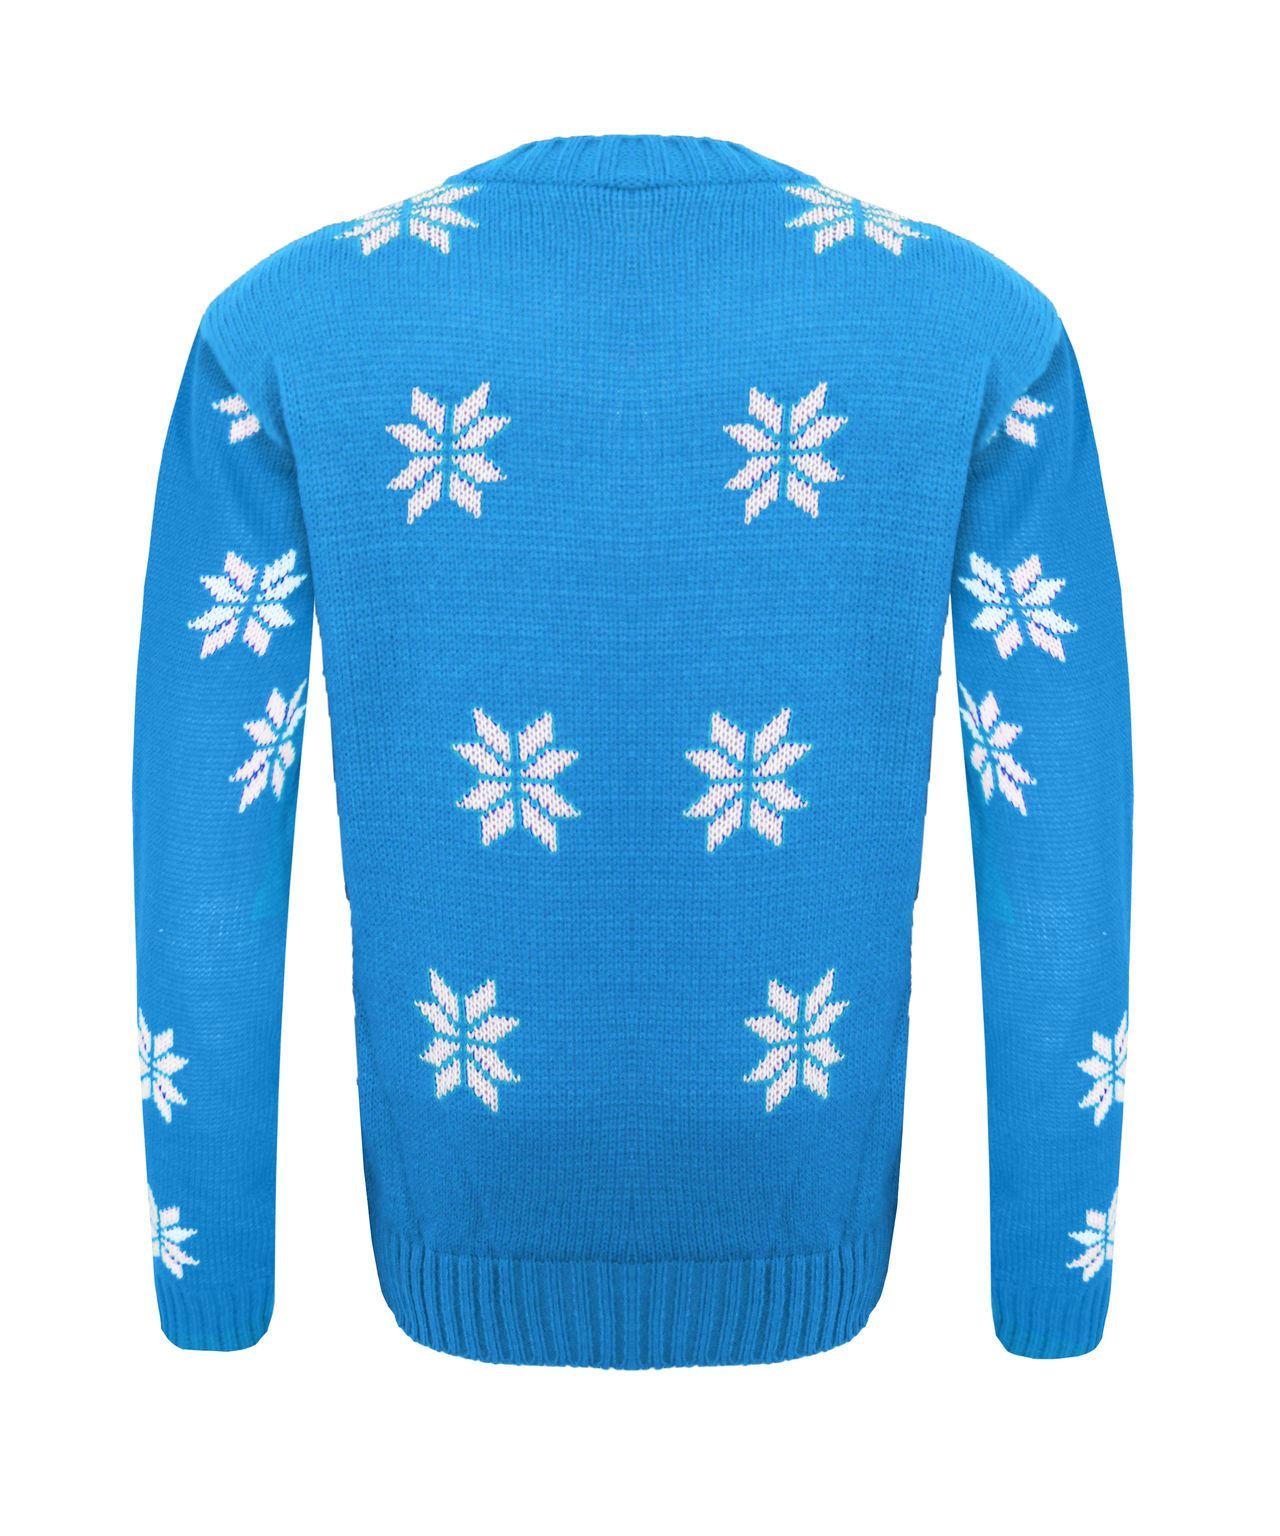 Kids Boy Girl Knitted Christmas Xmas Olaf Minion Chunky ...